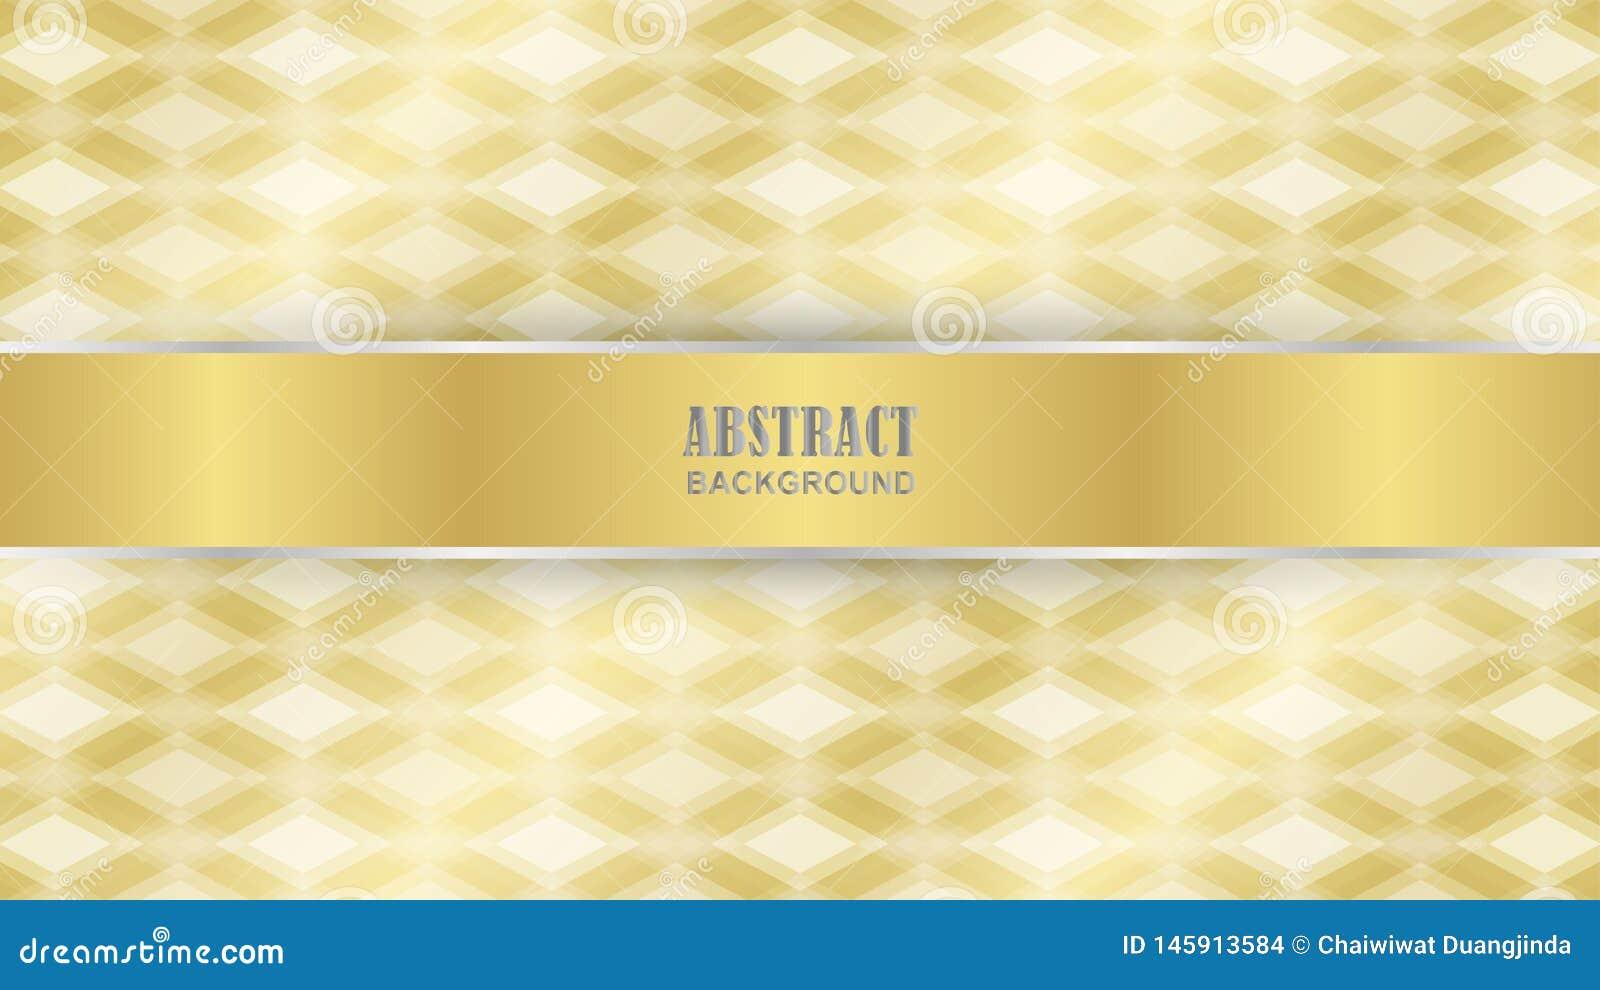 Gold diamond pattern as background